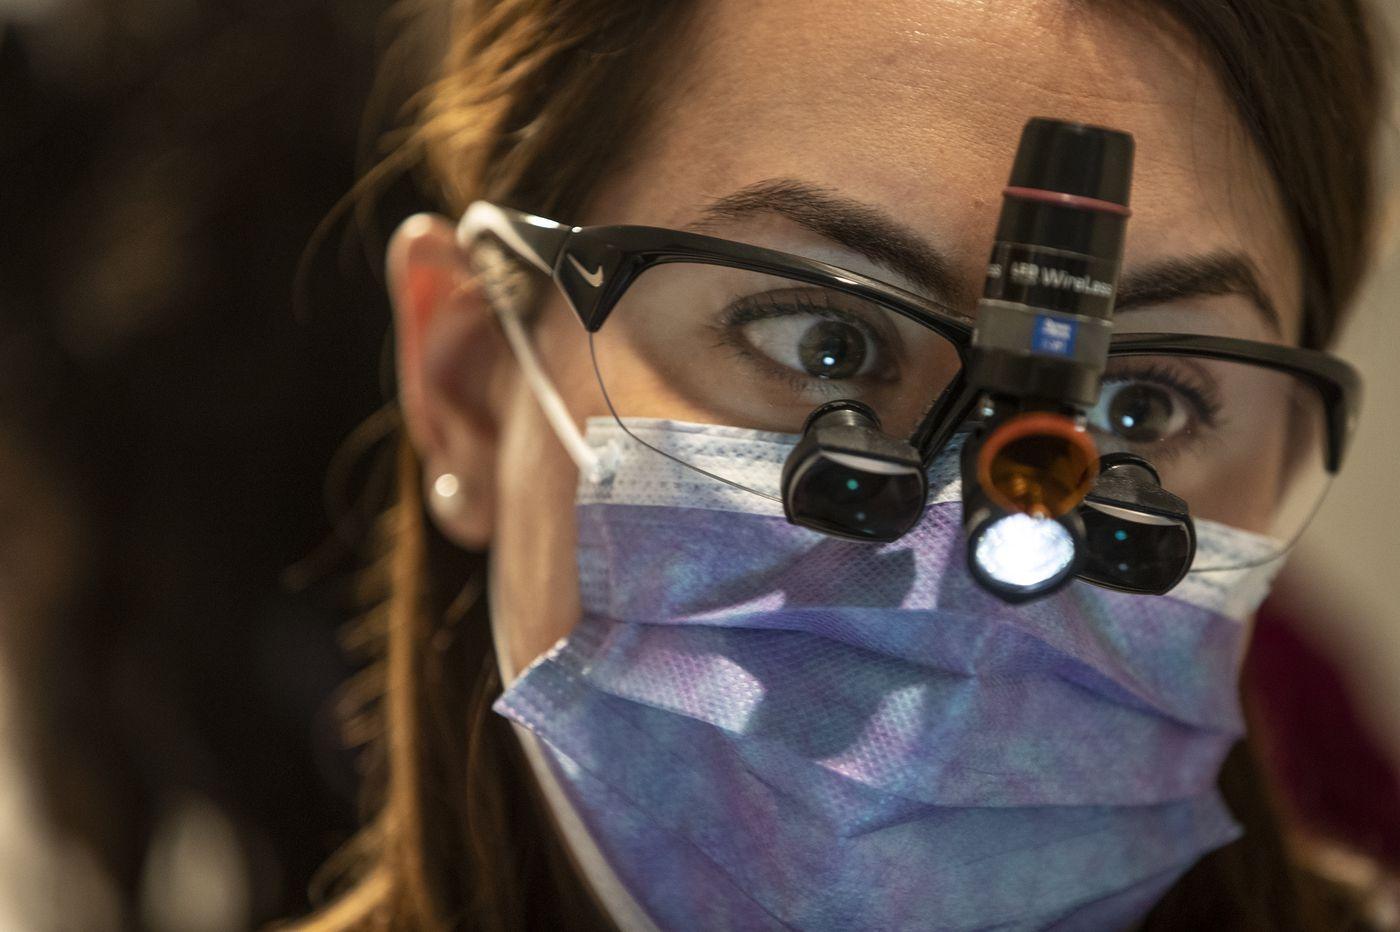 Under the Broad Street line, dentist Janine Burkhardt gets patients smiling again